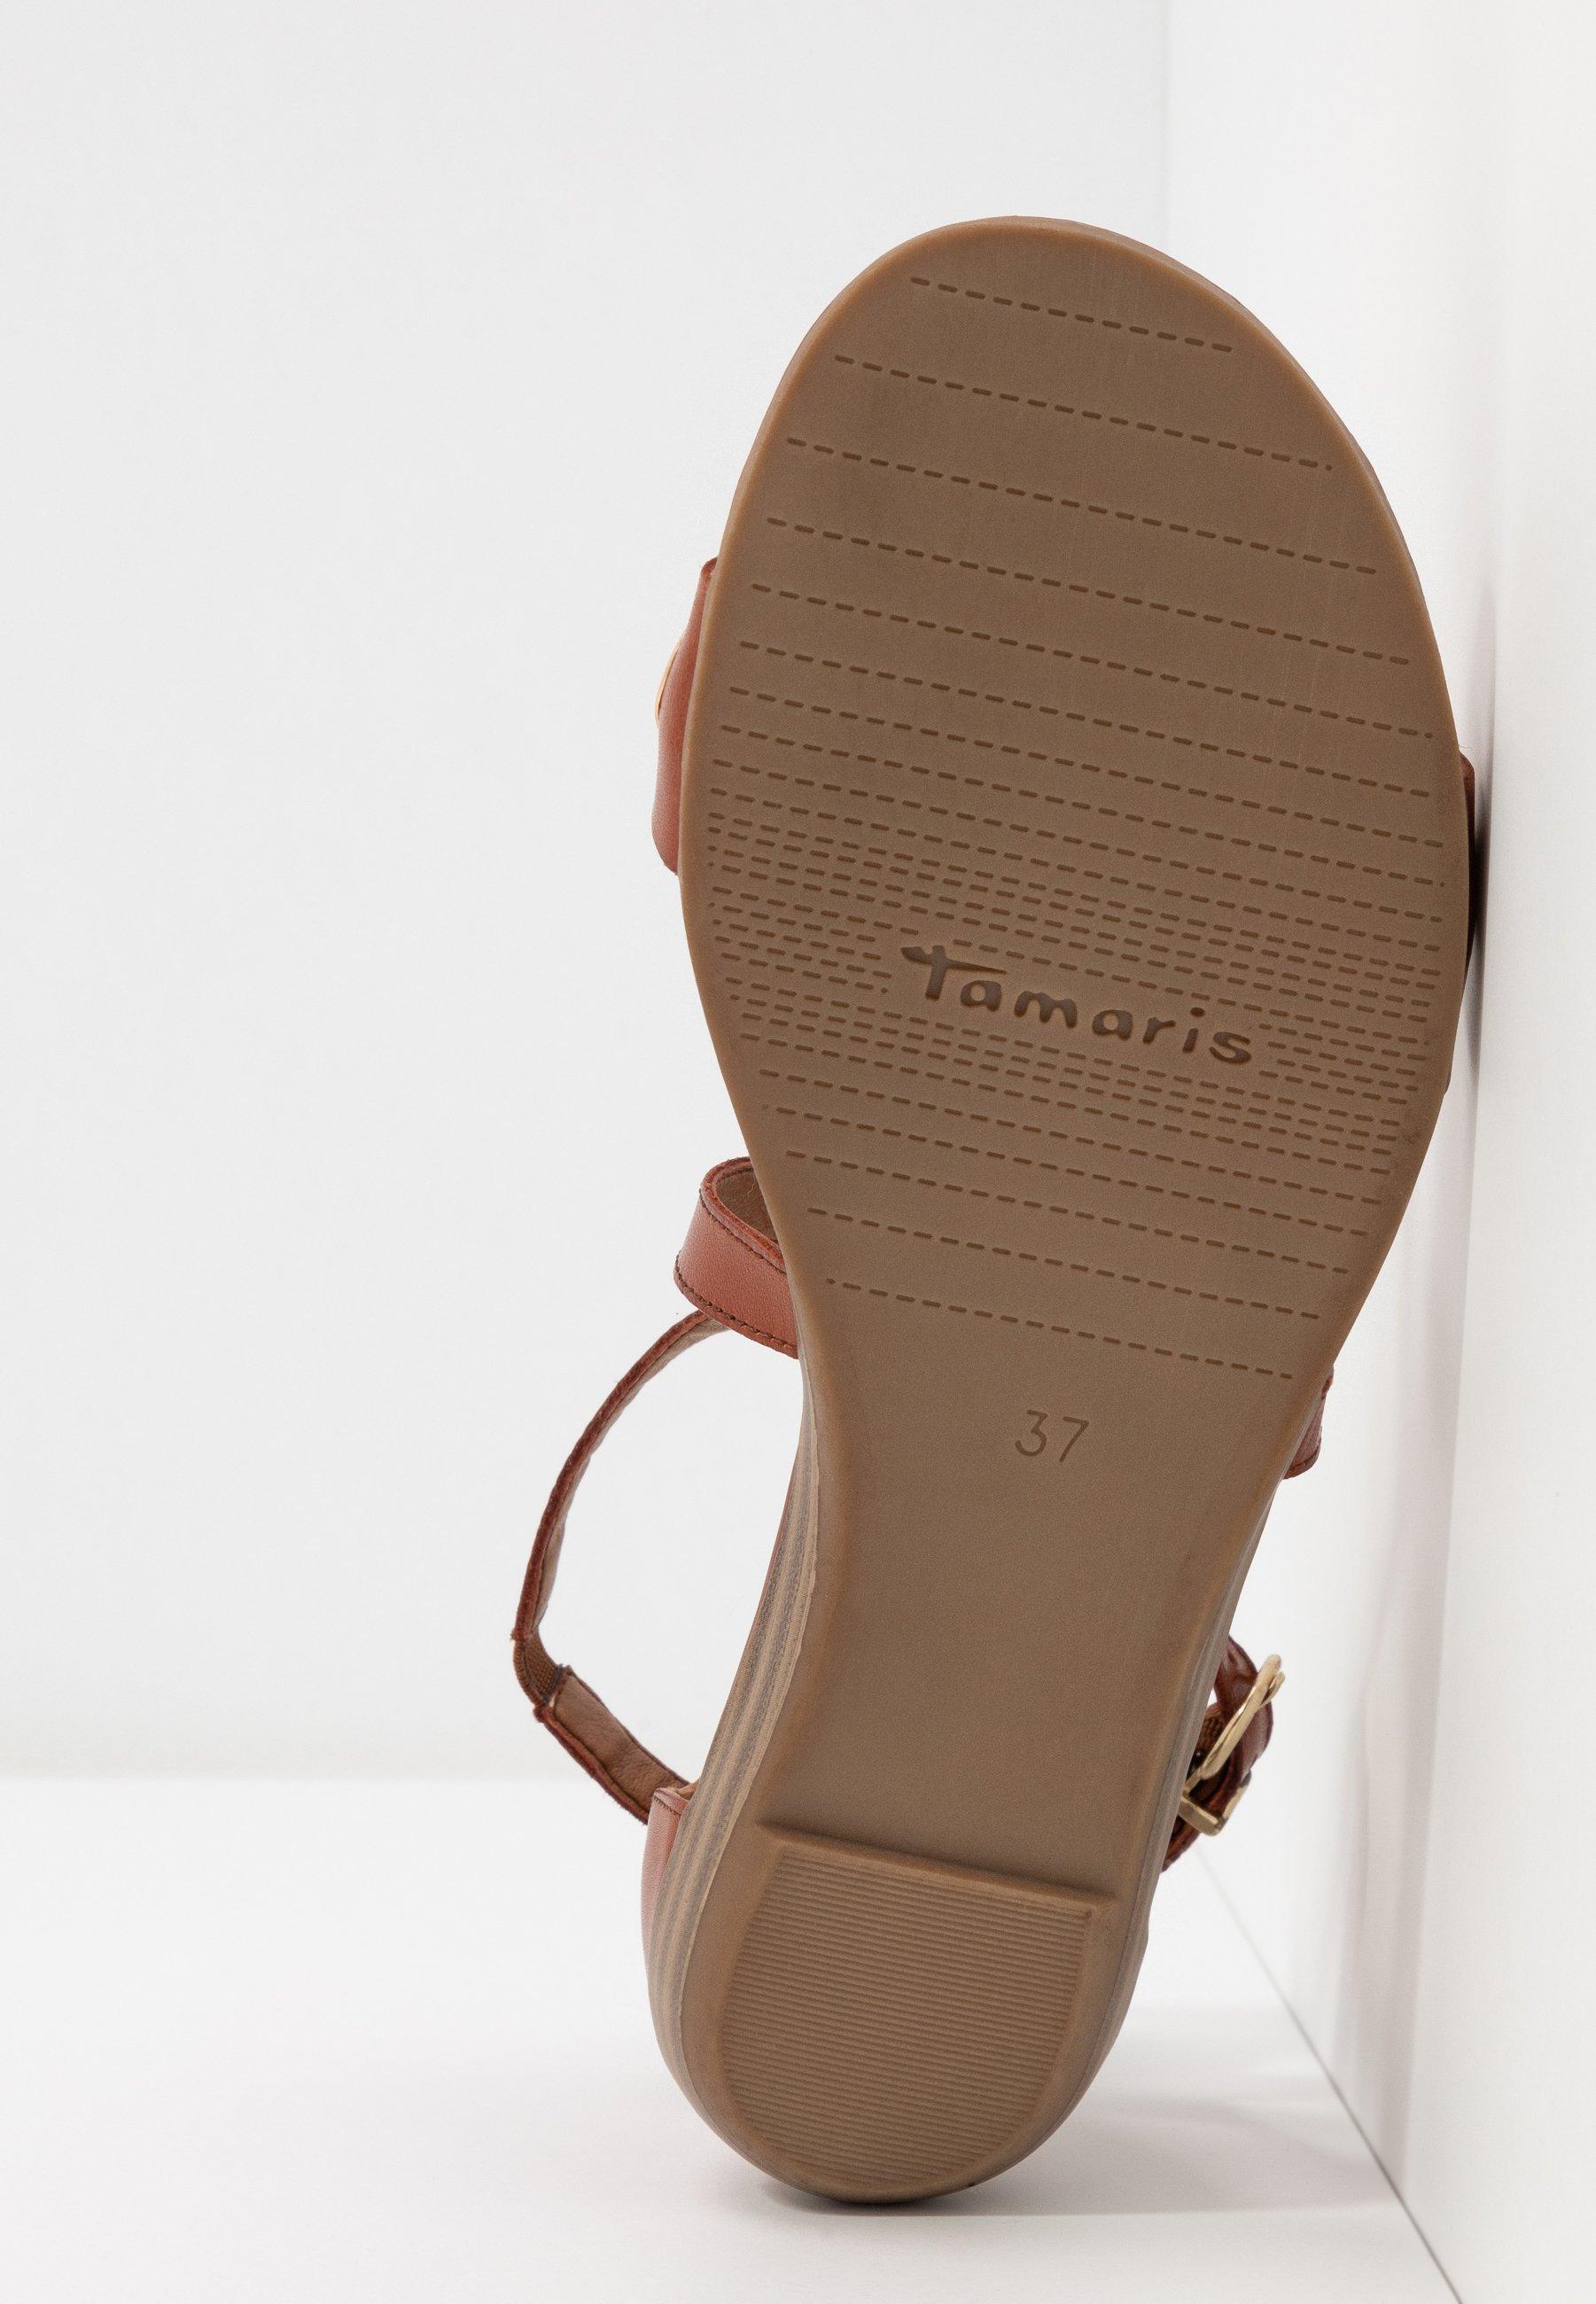 Tamaris Sandales - Brandy Comb E4W9muT